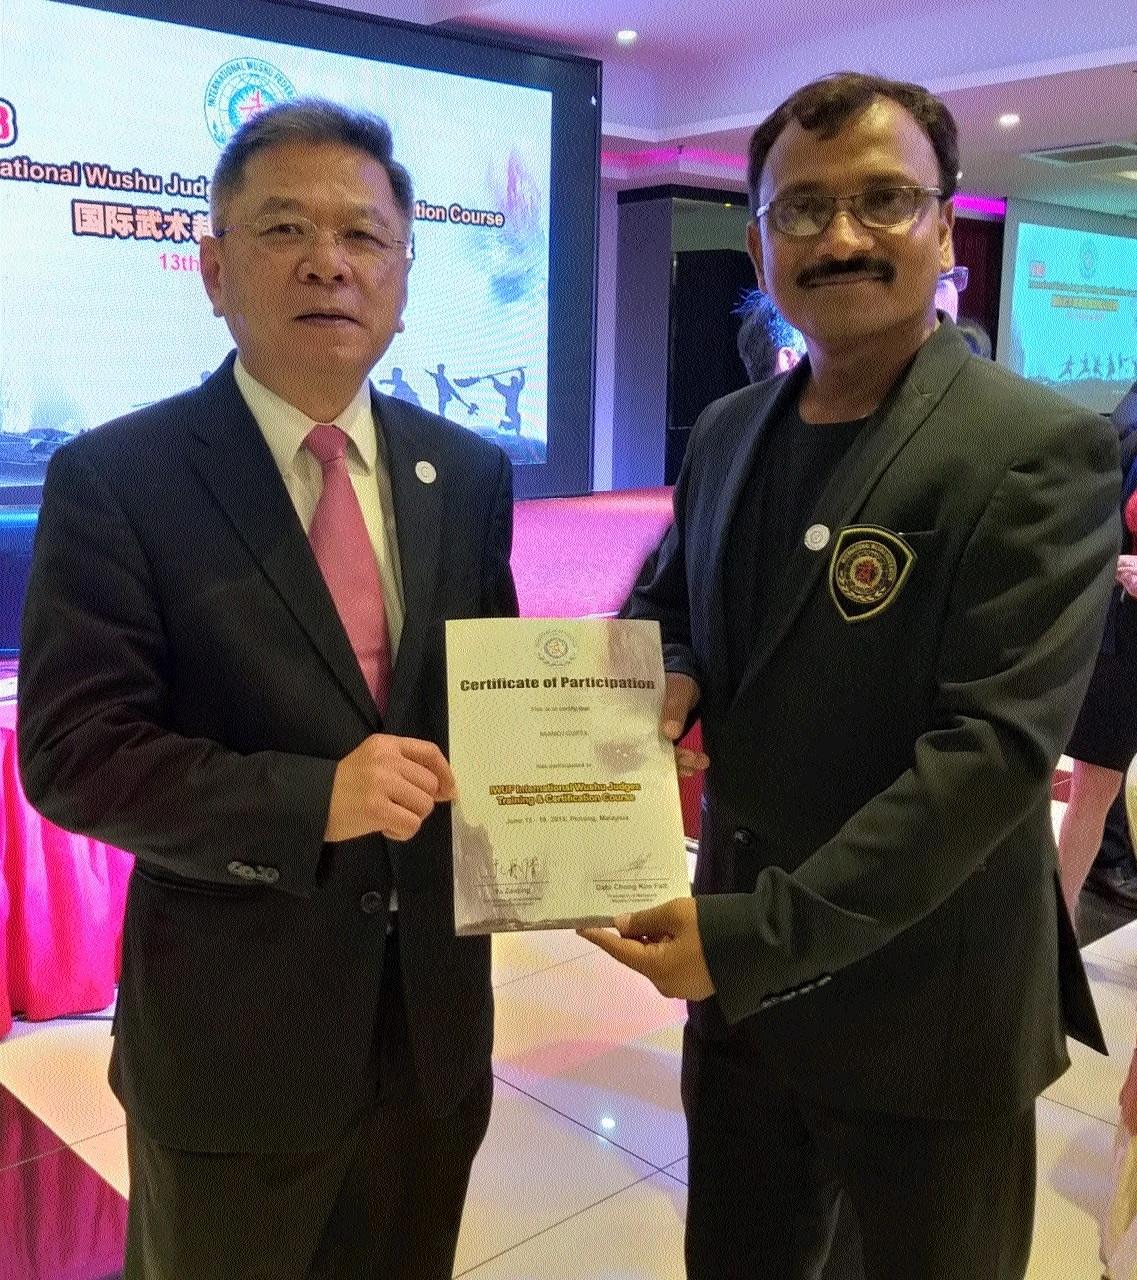 Manoj Gupta receives International Wushu Judge Certificate